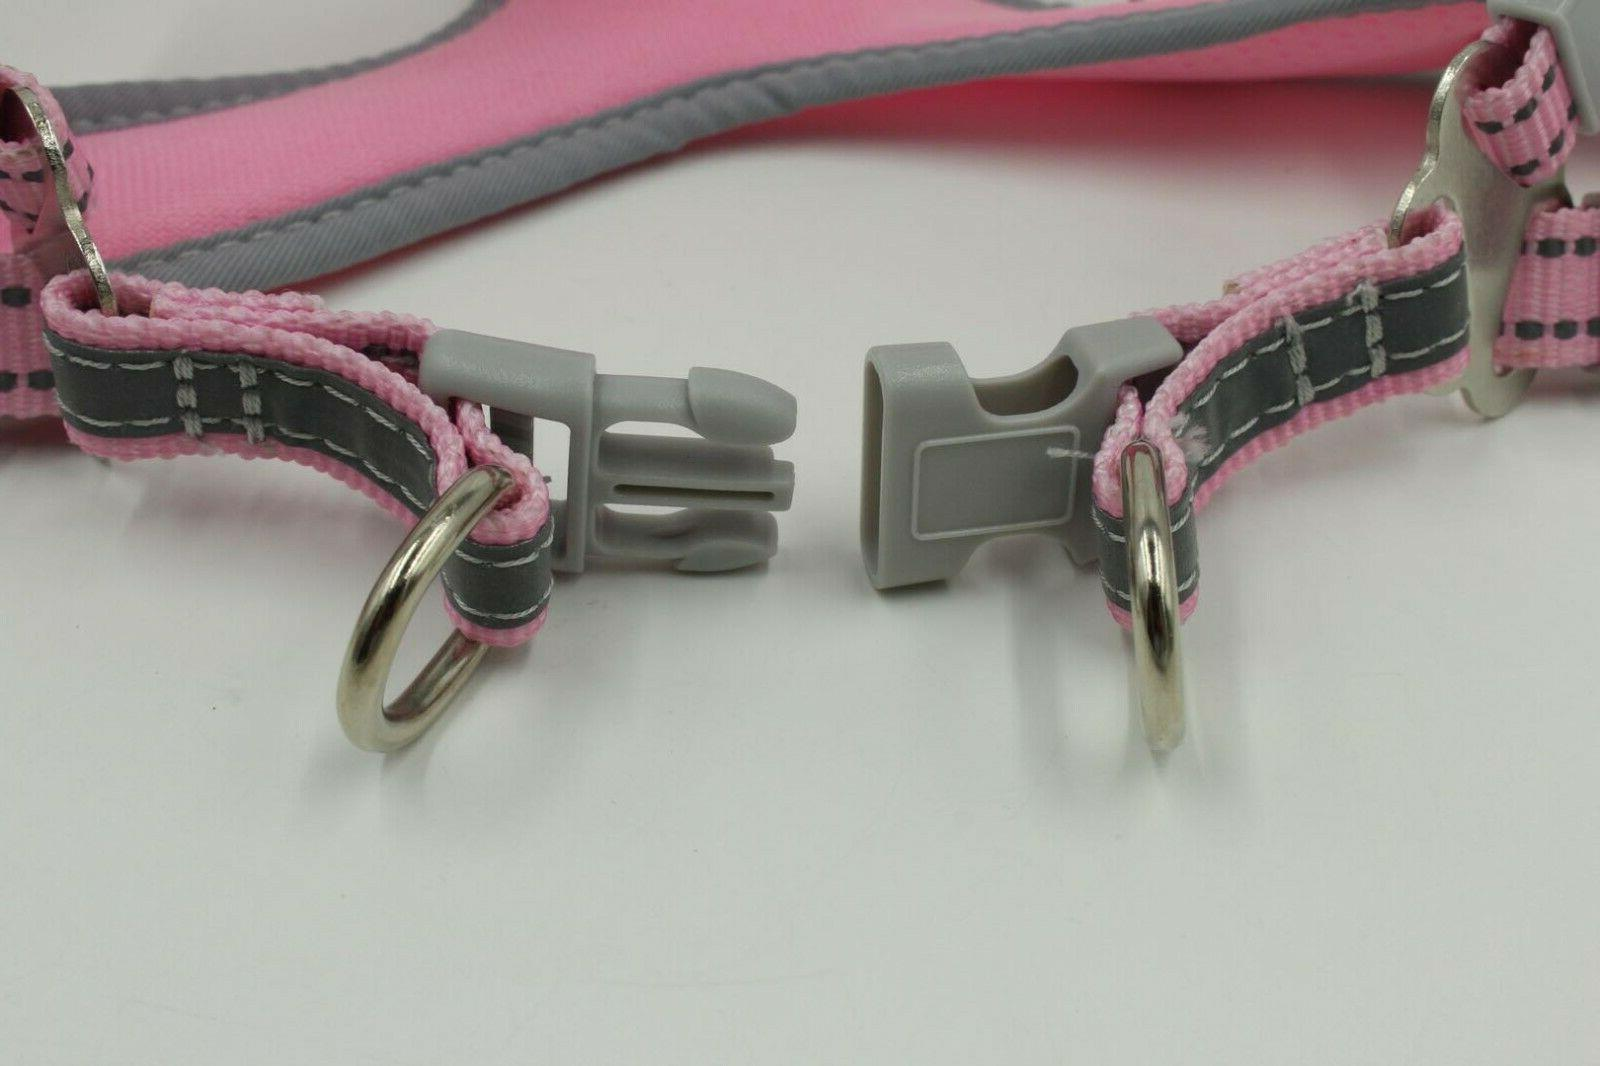 USA Reflective Harness Leash Collar No Pull Adjustable XS-L